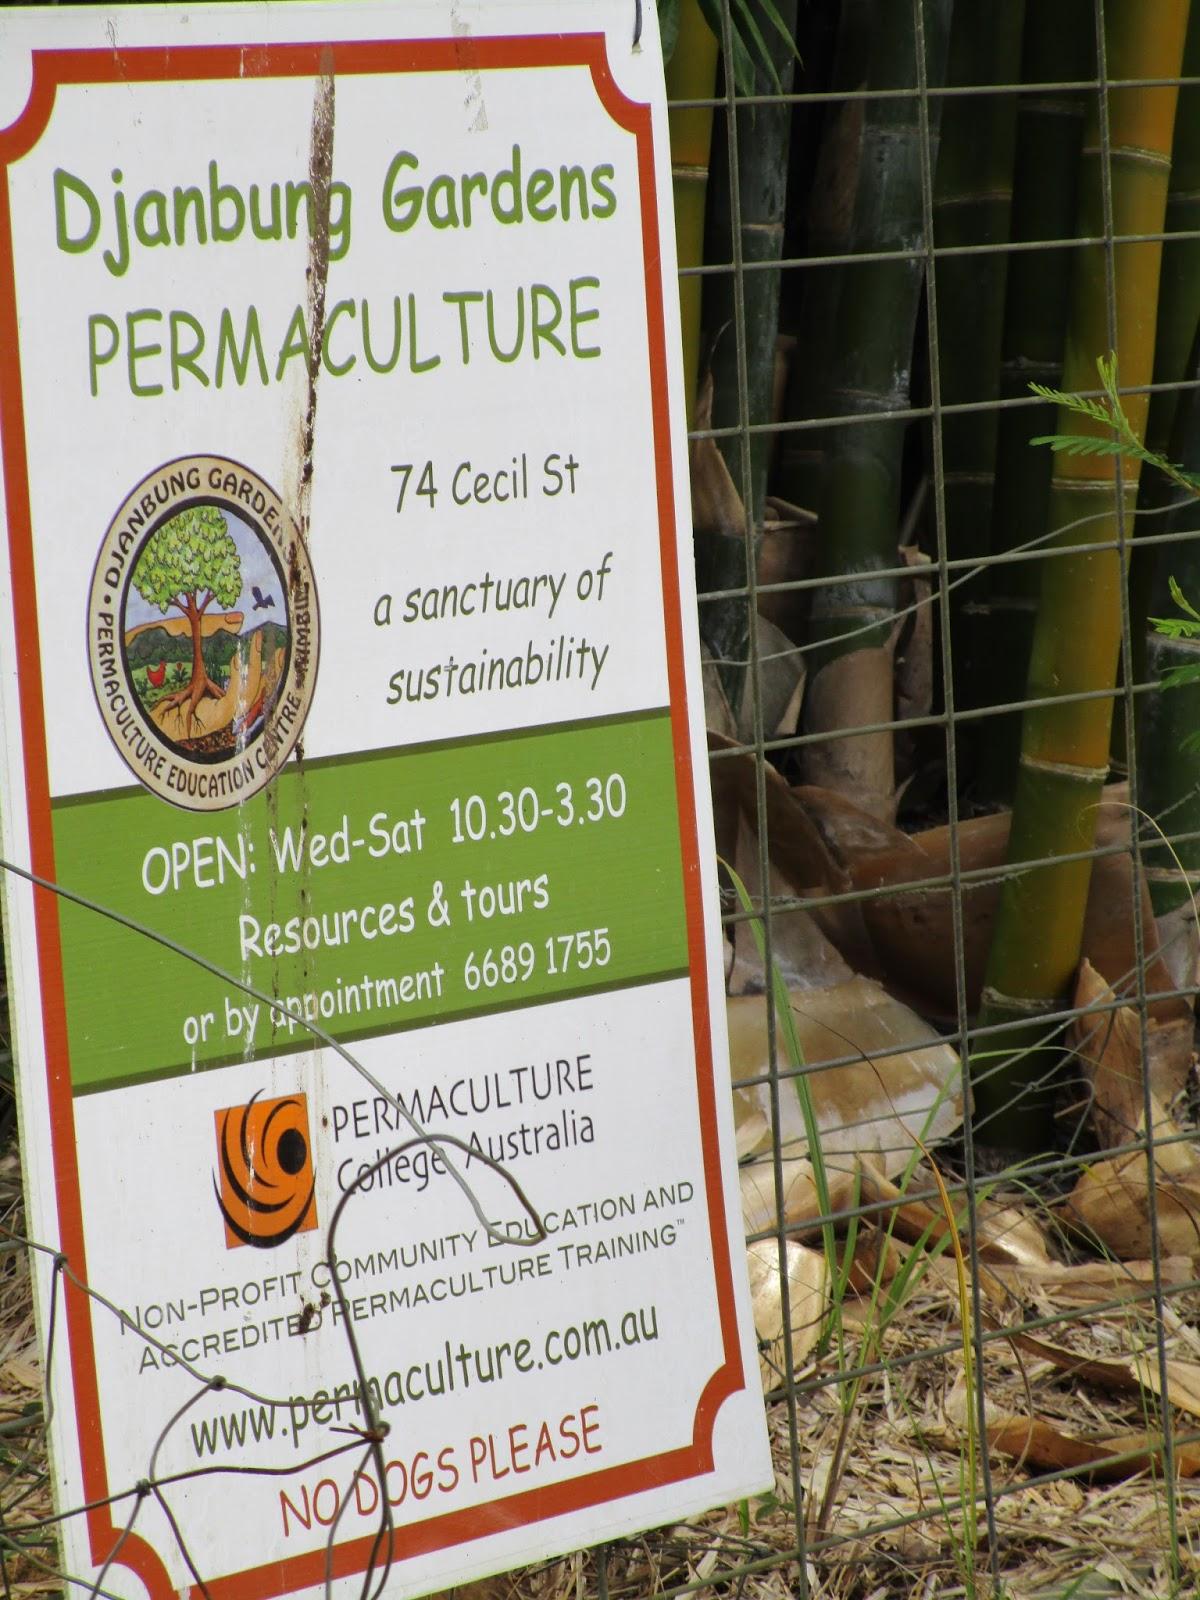 Soil sun soul tour and visit of djanbung gardens for Soil tour dates 2015